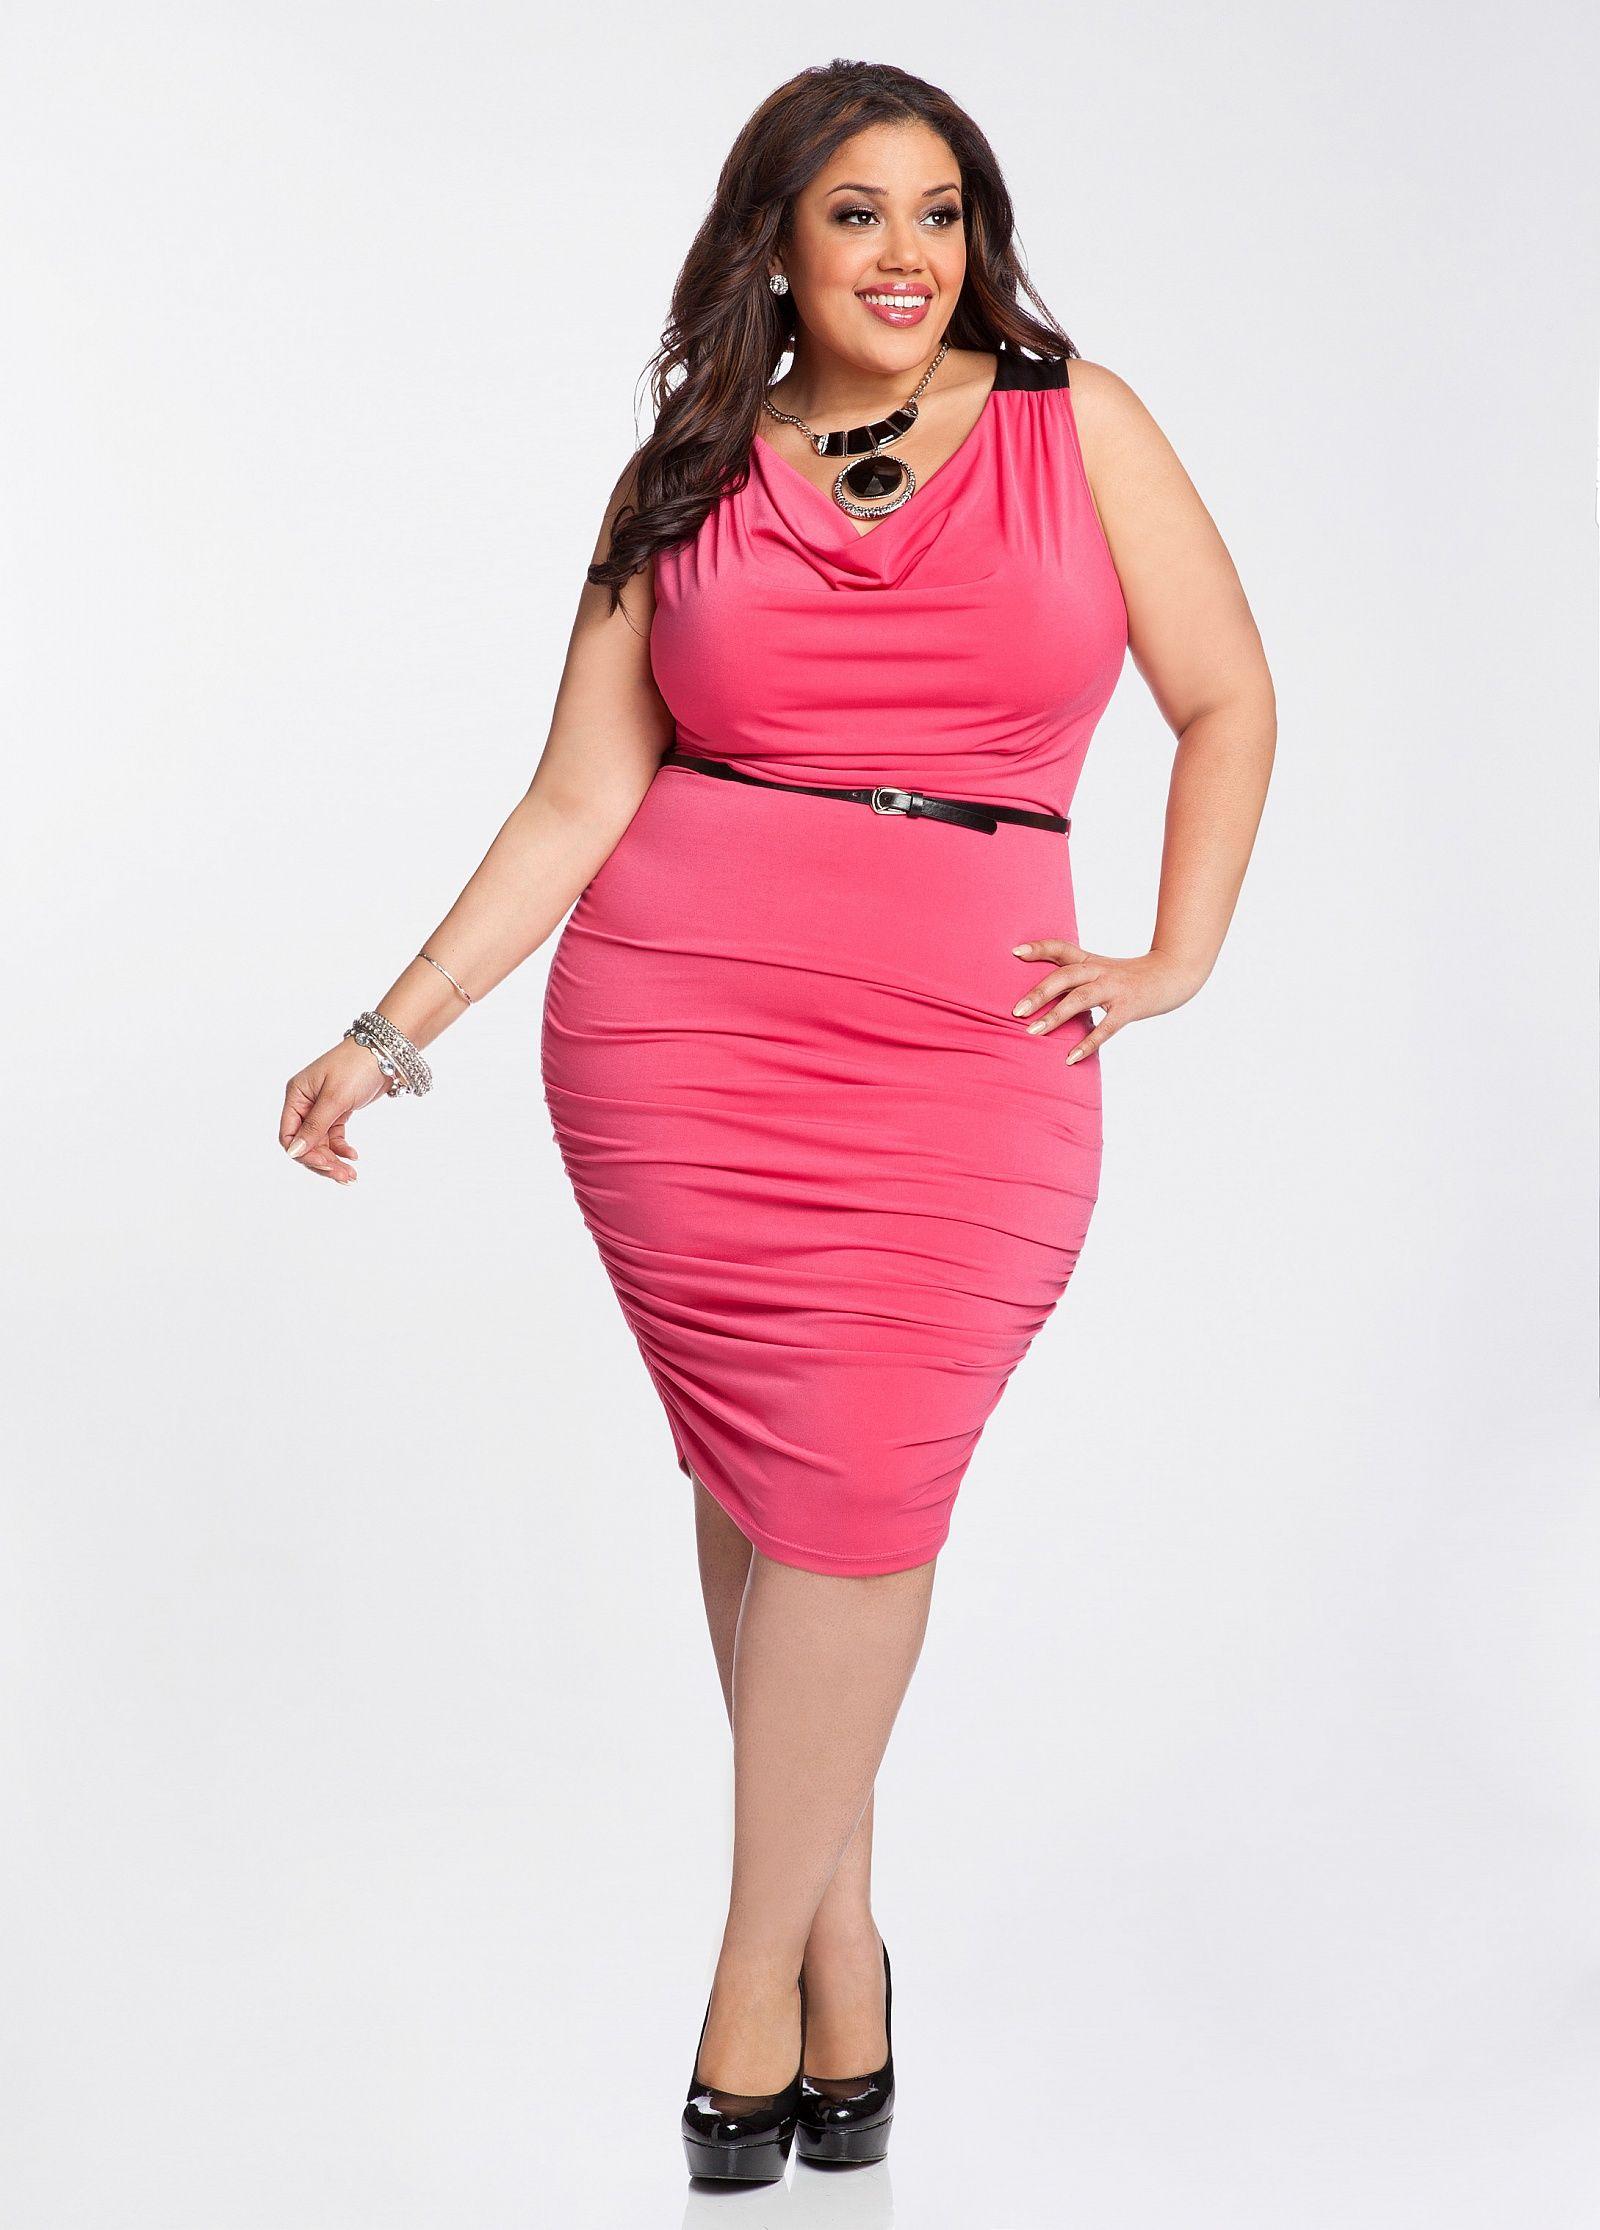 Ashley Stewart: Ruched Accent Plus Size Dress | Fashion: Styling ...